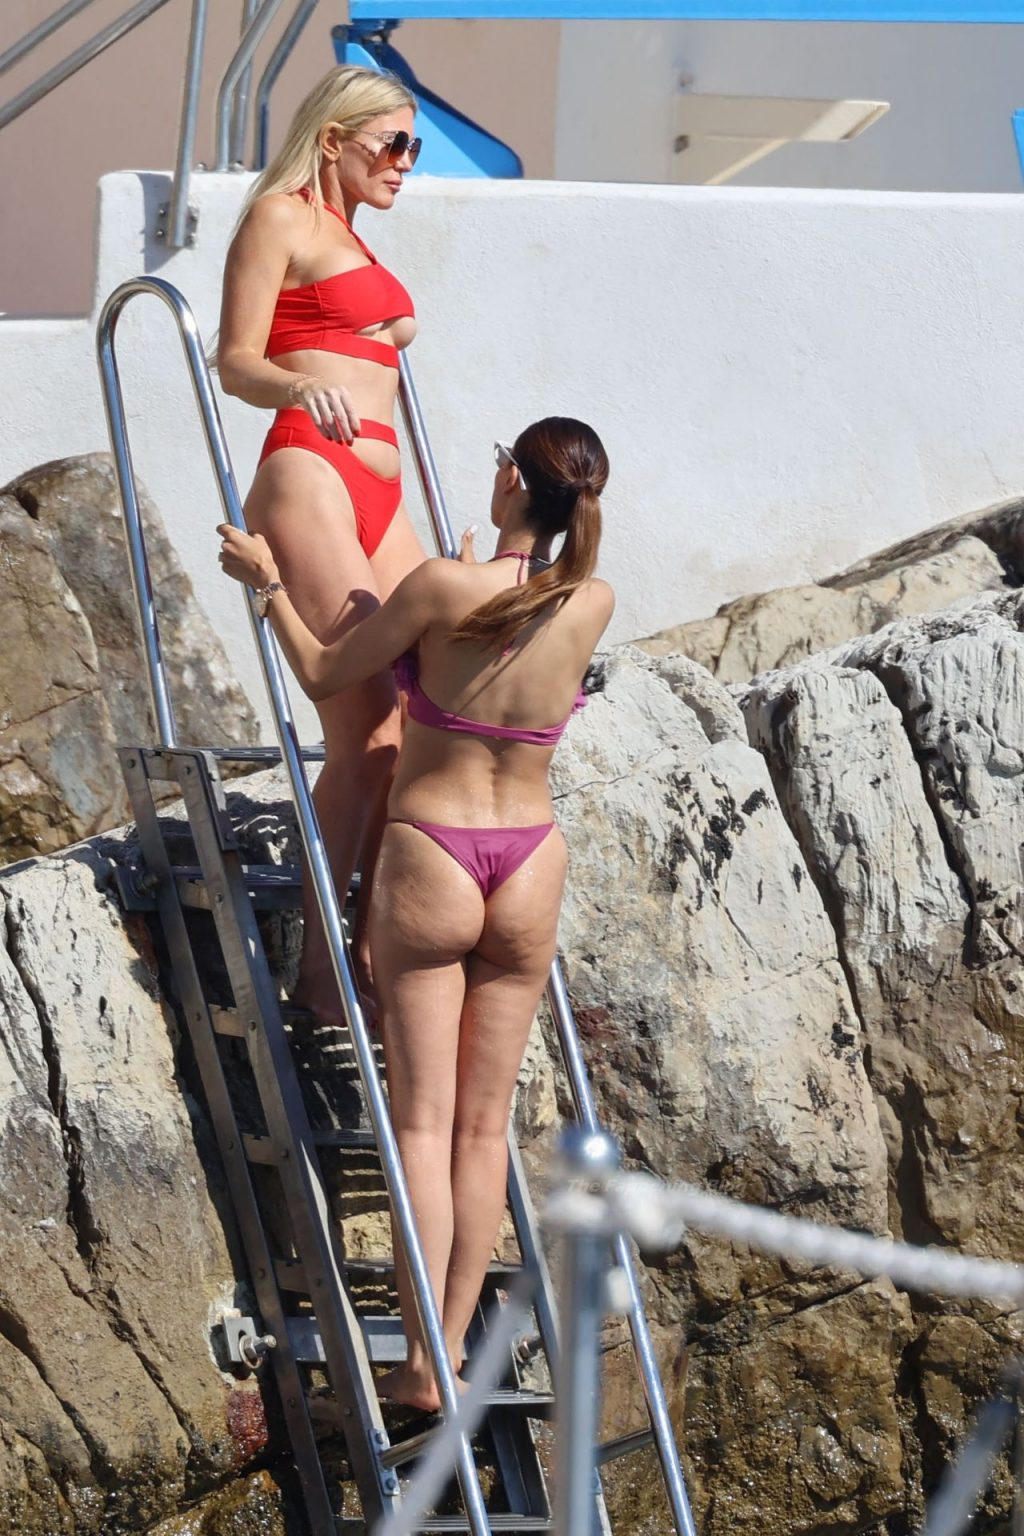 Hofit Golan Shows Off Her Underboob in a Red Bikini (17 Photos)